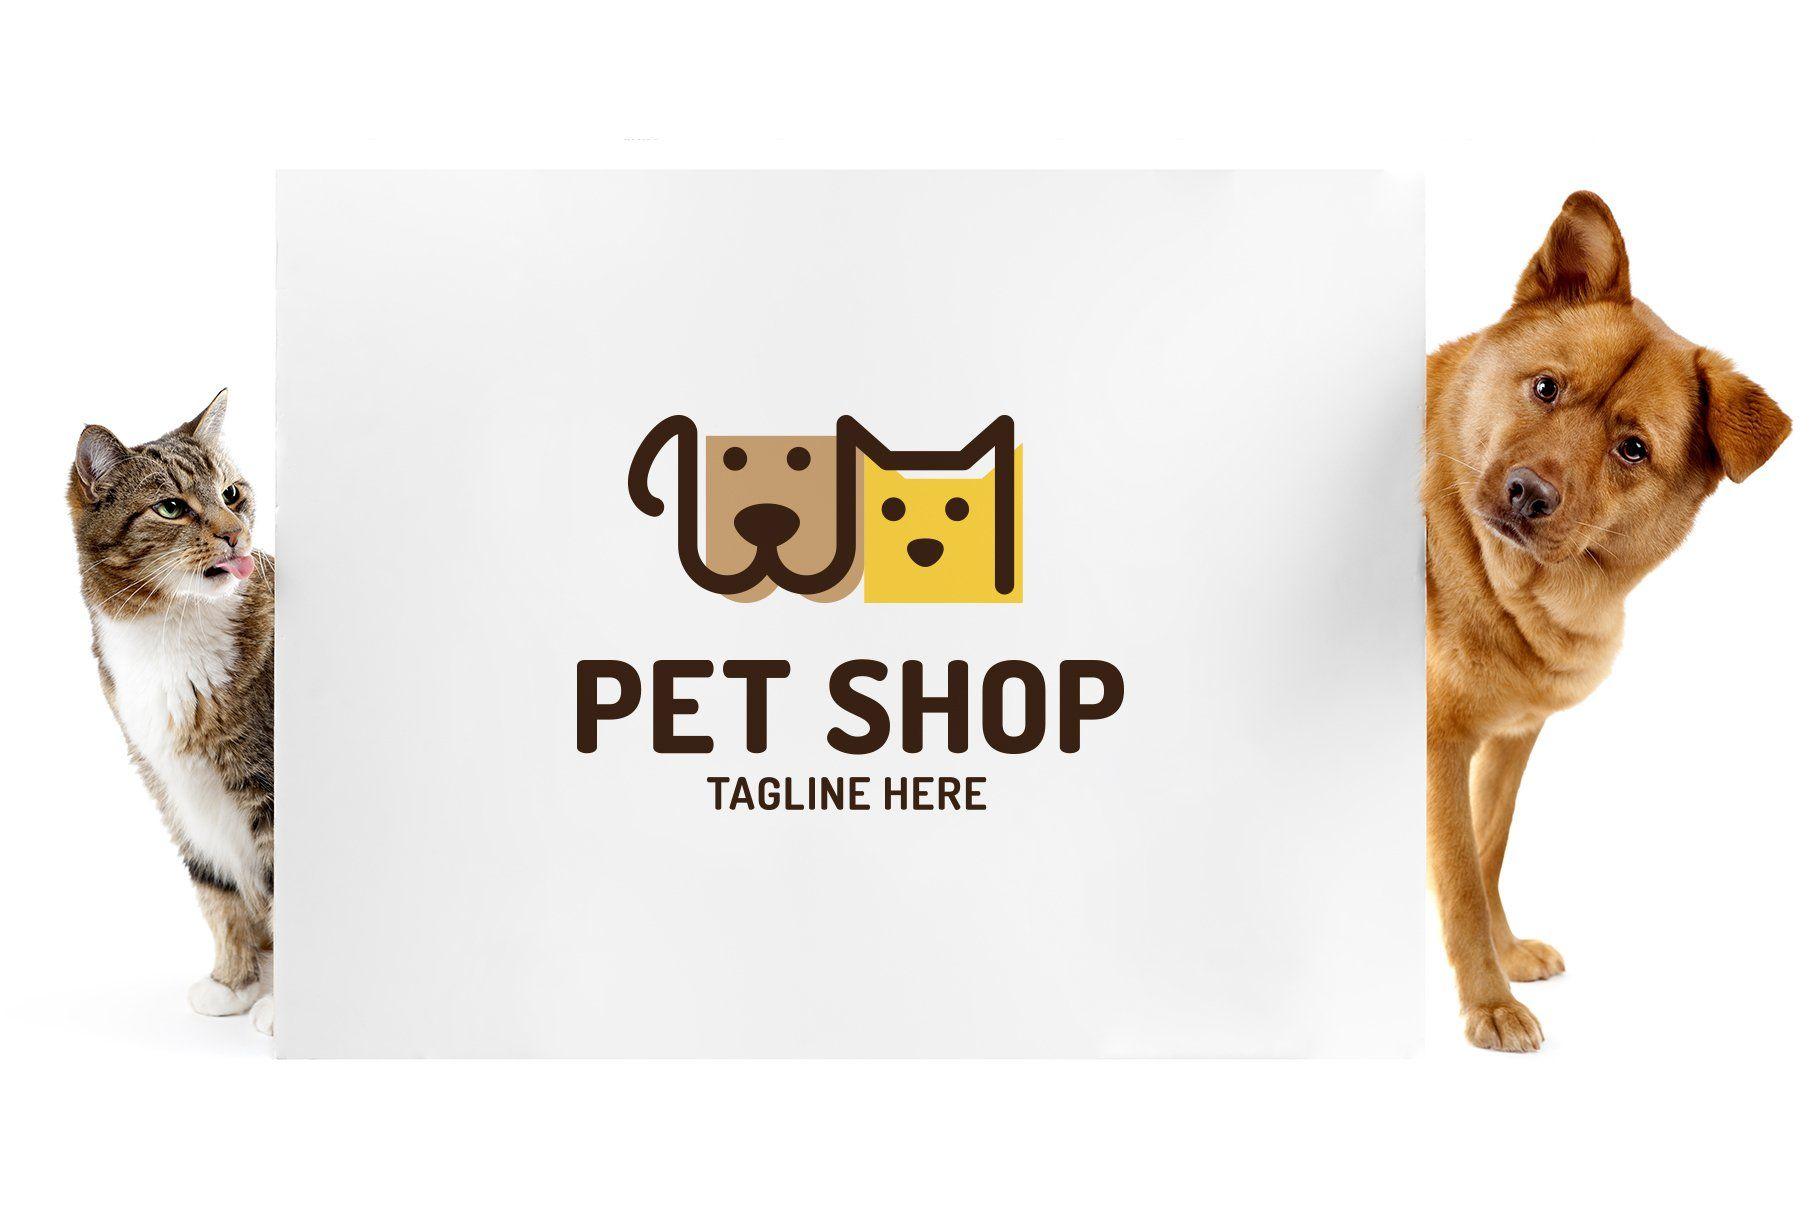 Pet Shop Logo In 2020 Pet Shop Logo Shop Logo Pet Shop